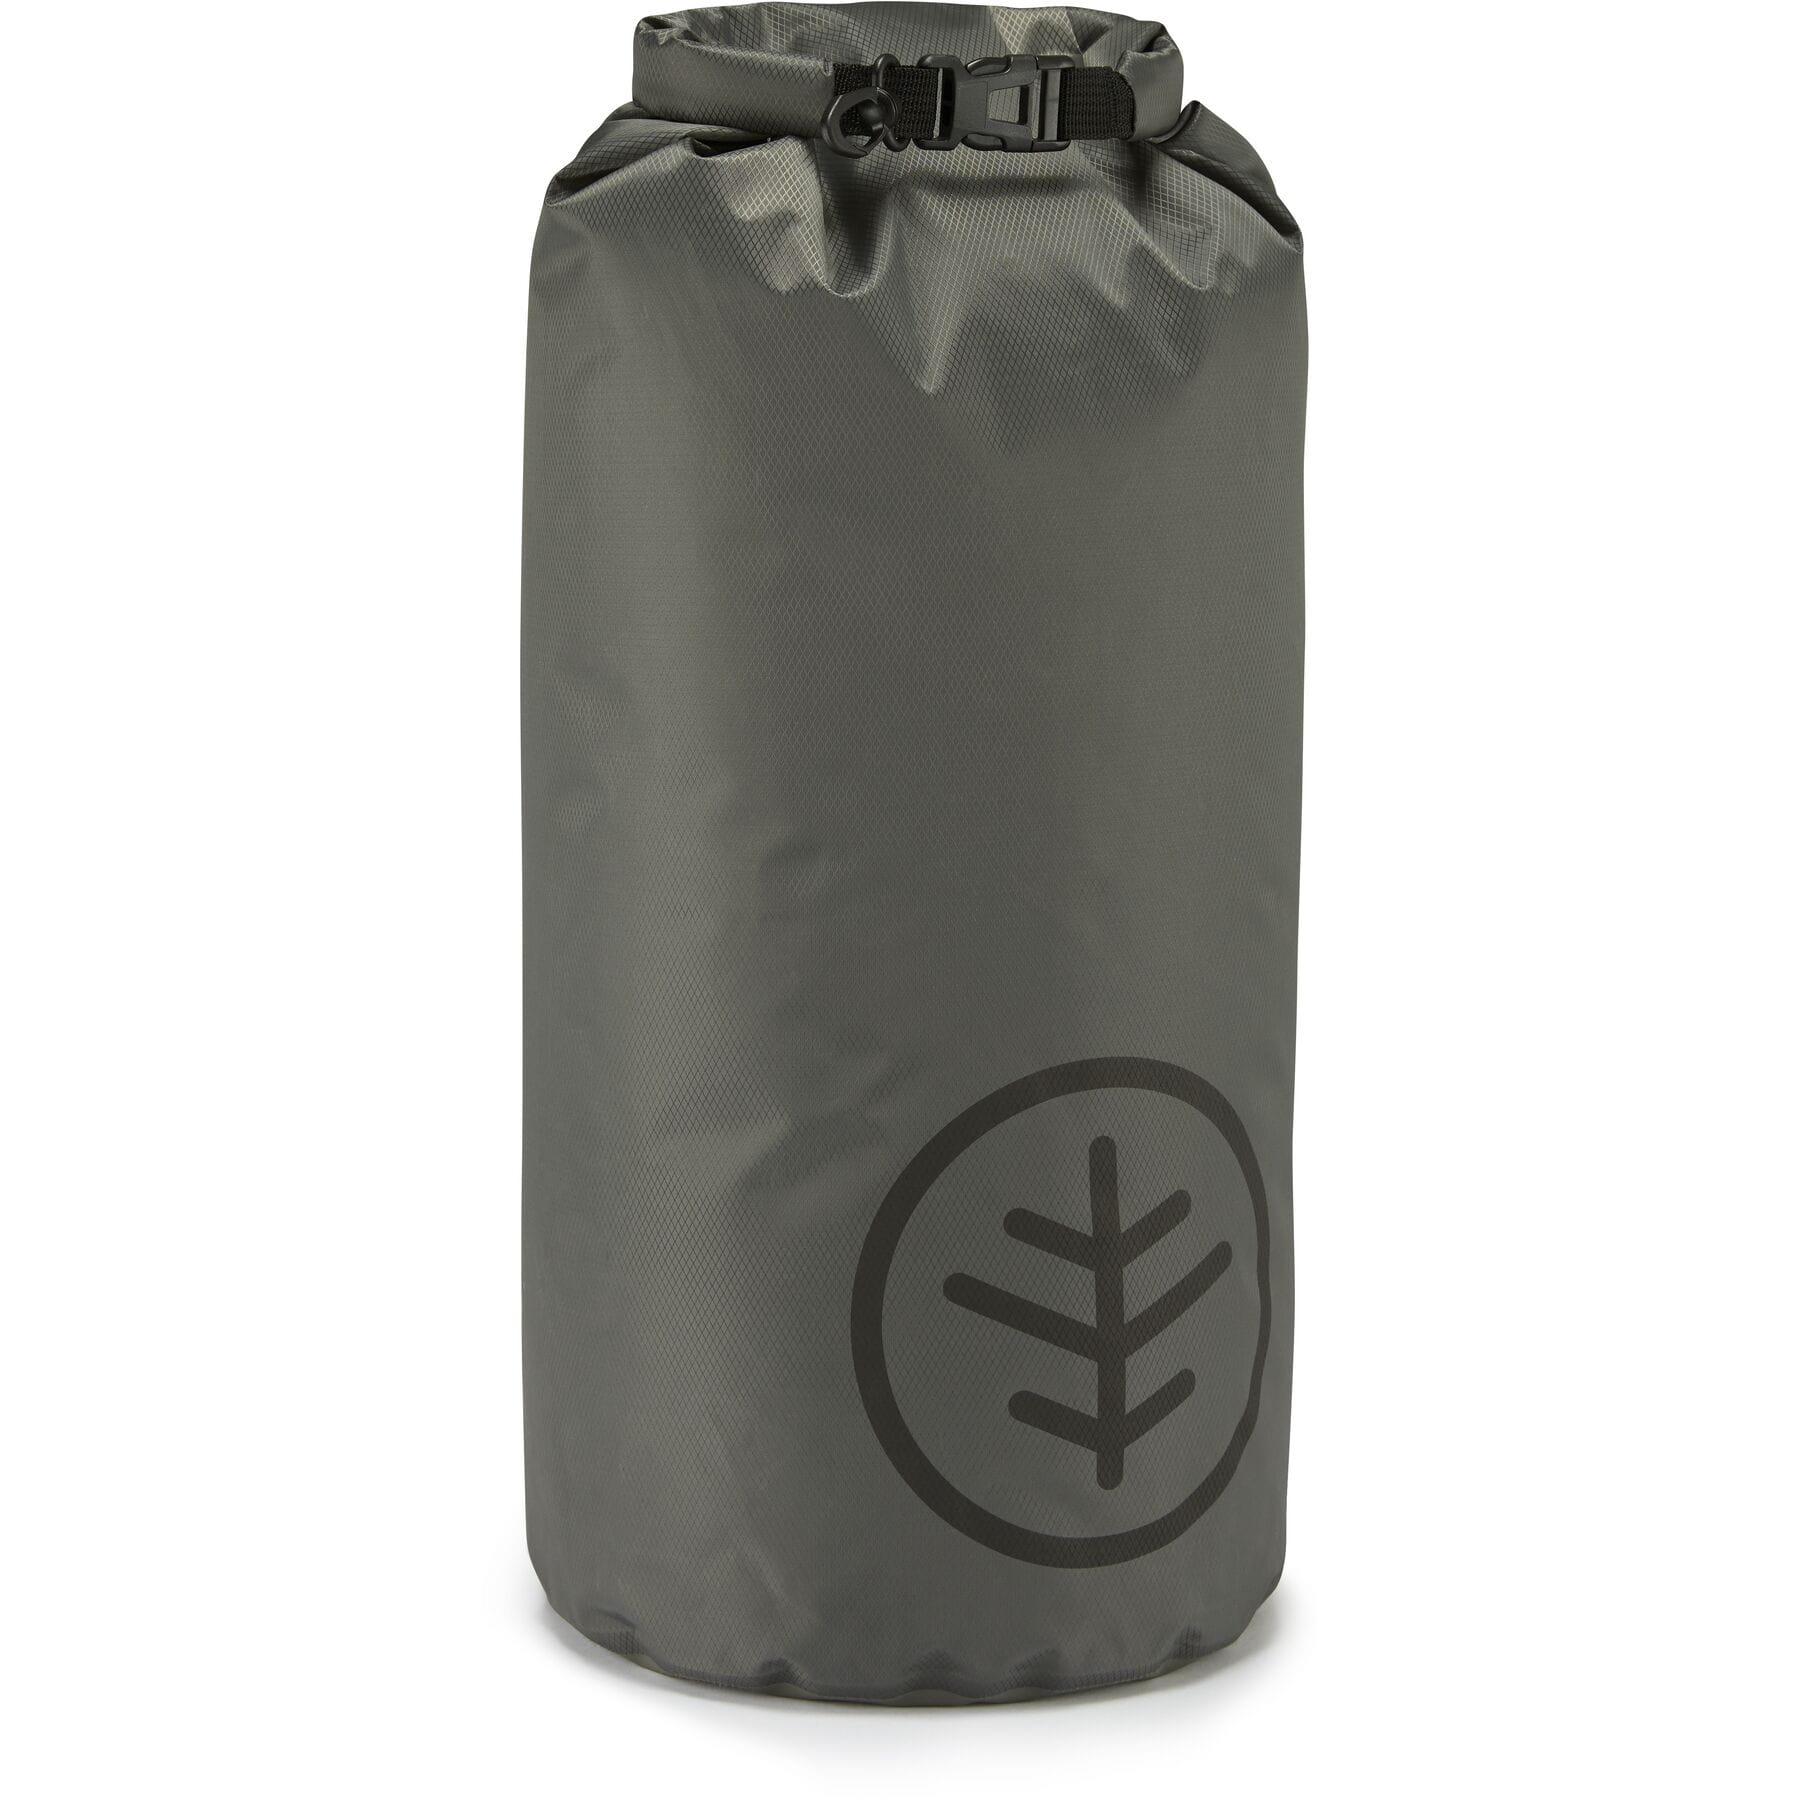 Vak Wychwood Dry Bag 25ltr